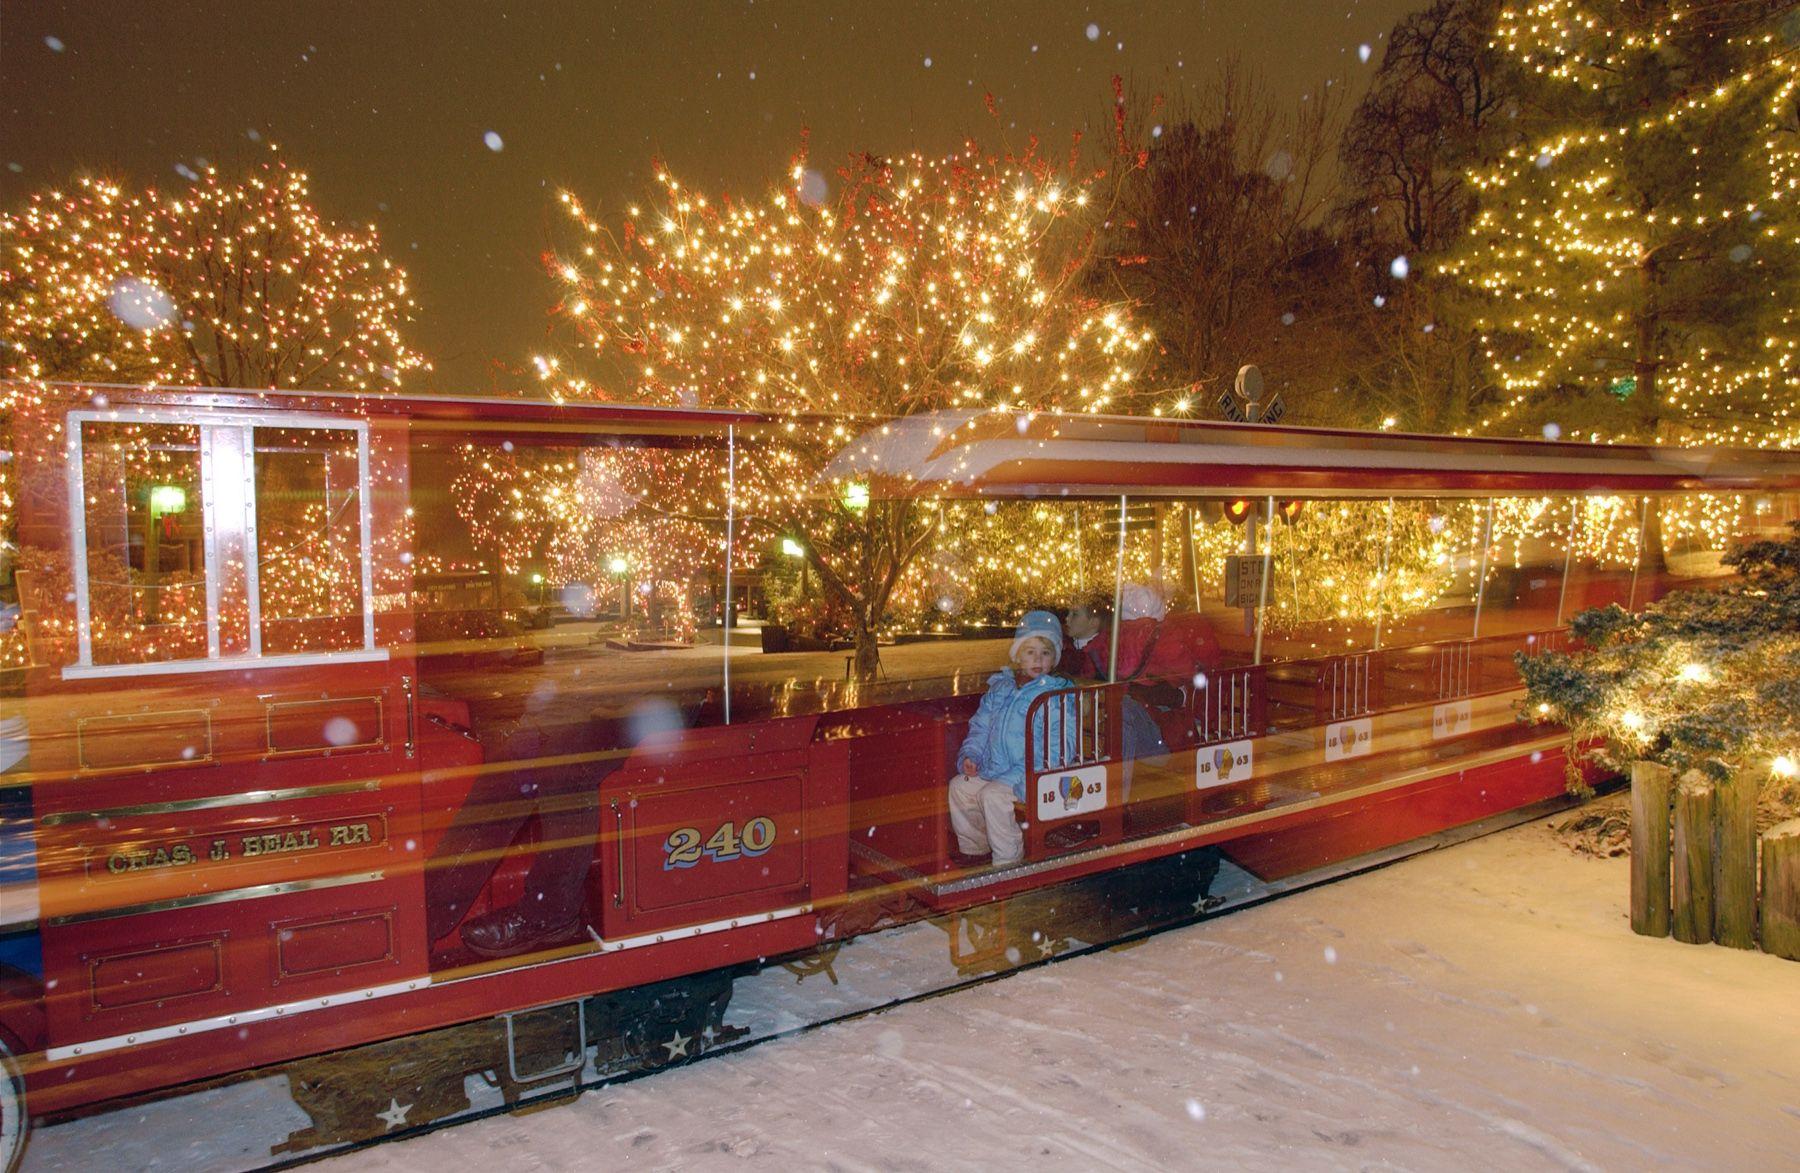 train rides pnc festival of lights pinterest train rides